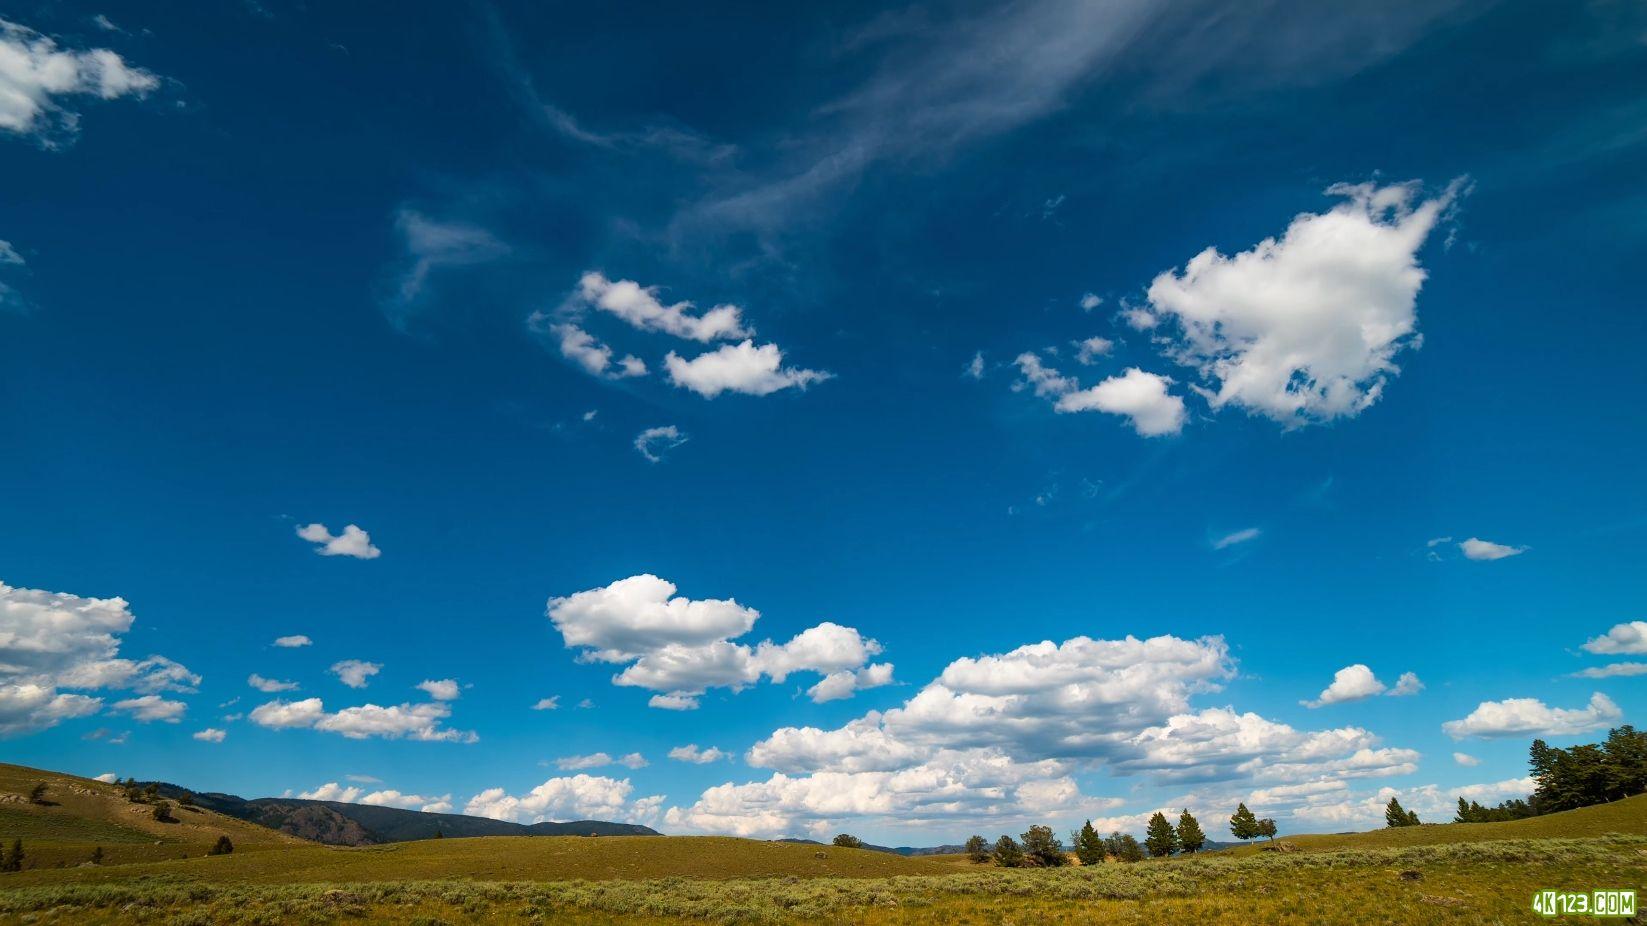 Yellowstone National Park - 4K (Ultra HD) Nature Documentary Film - EPISODE 1_М.jpg